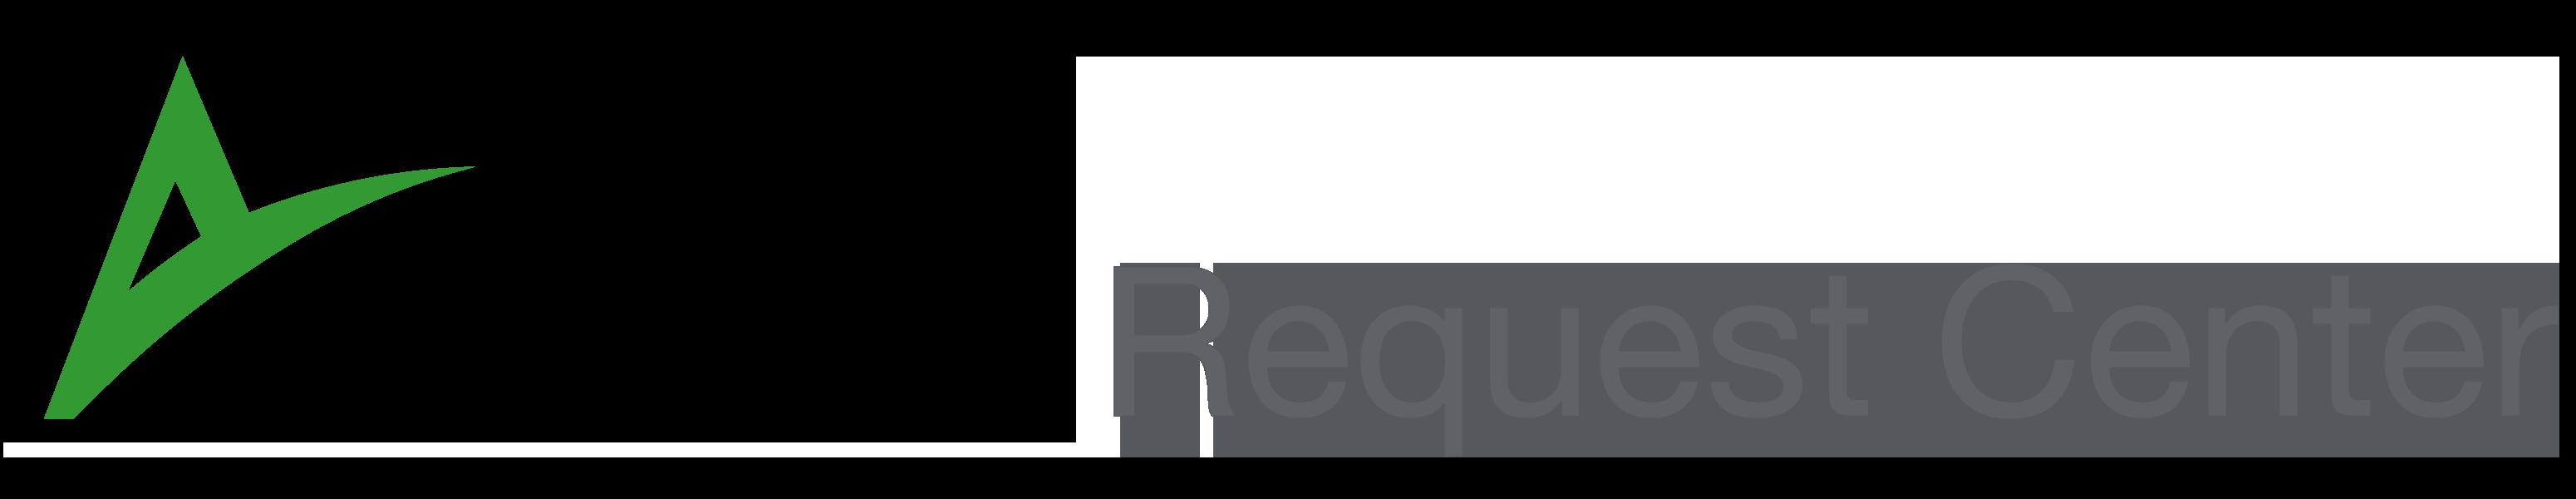 Aliud request center logo on transparent background.